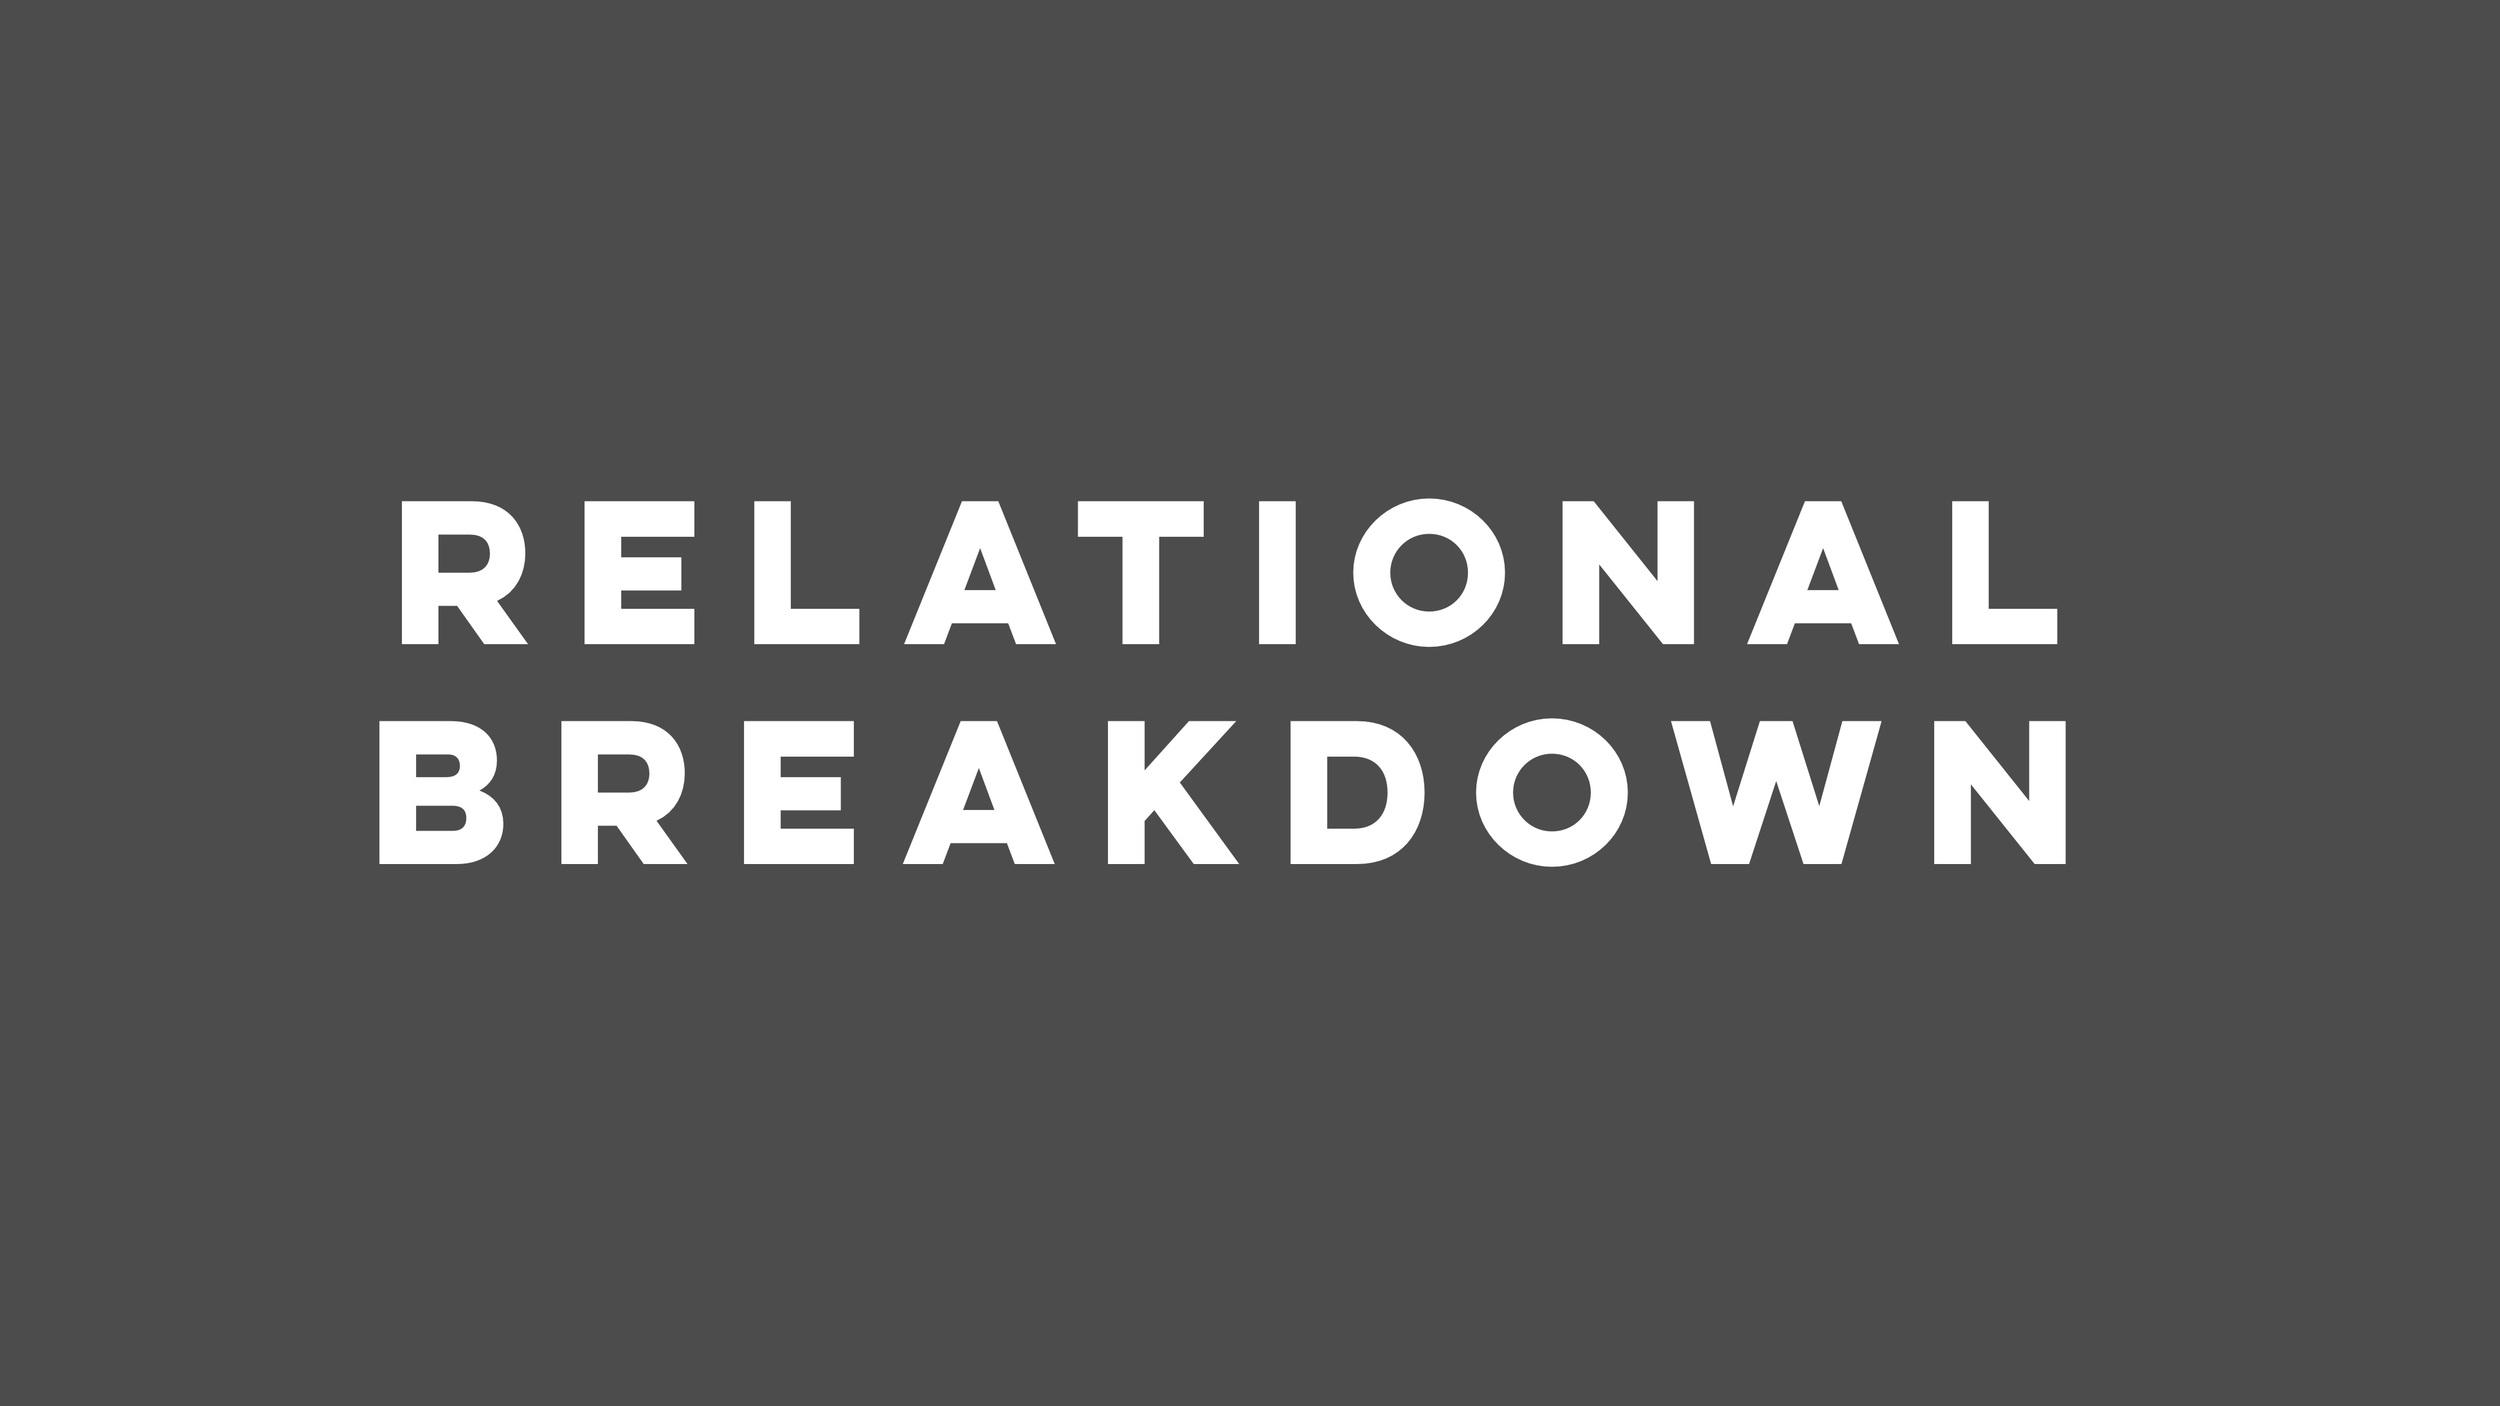 Relational breakdown.jpg